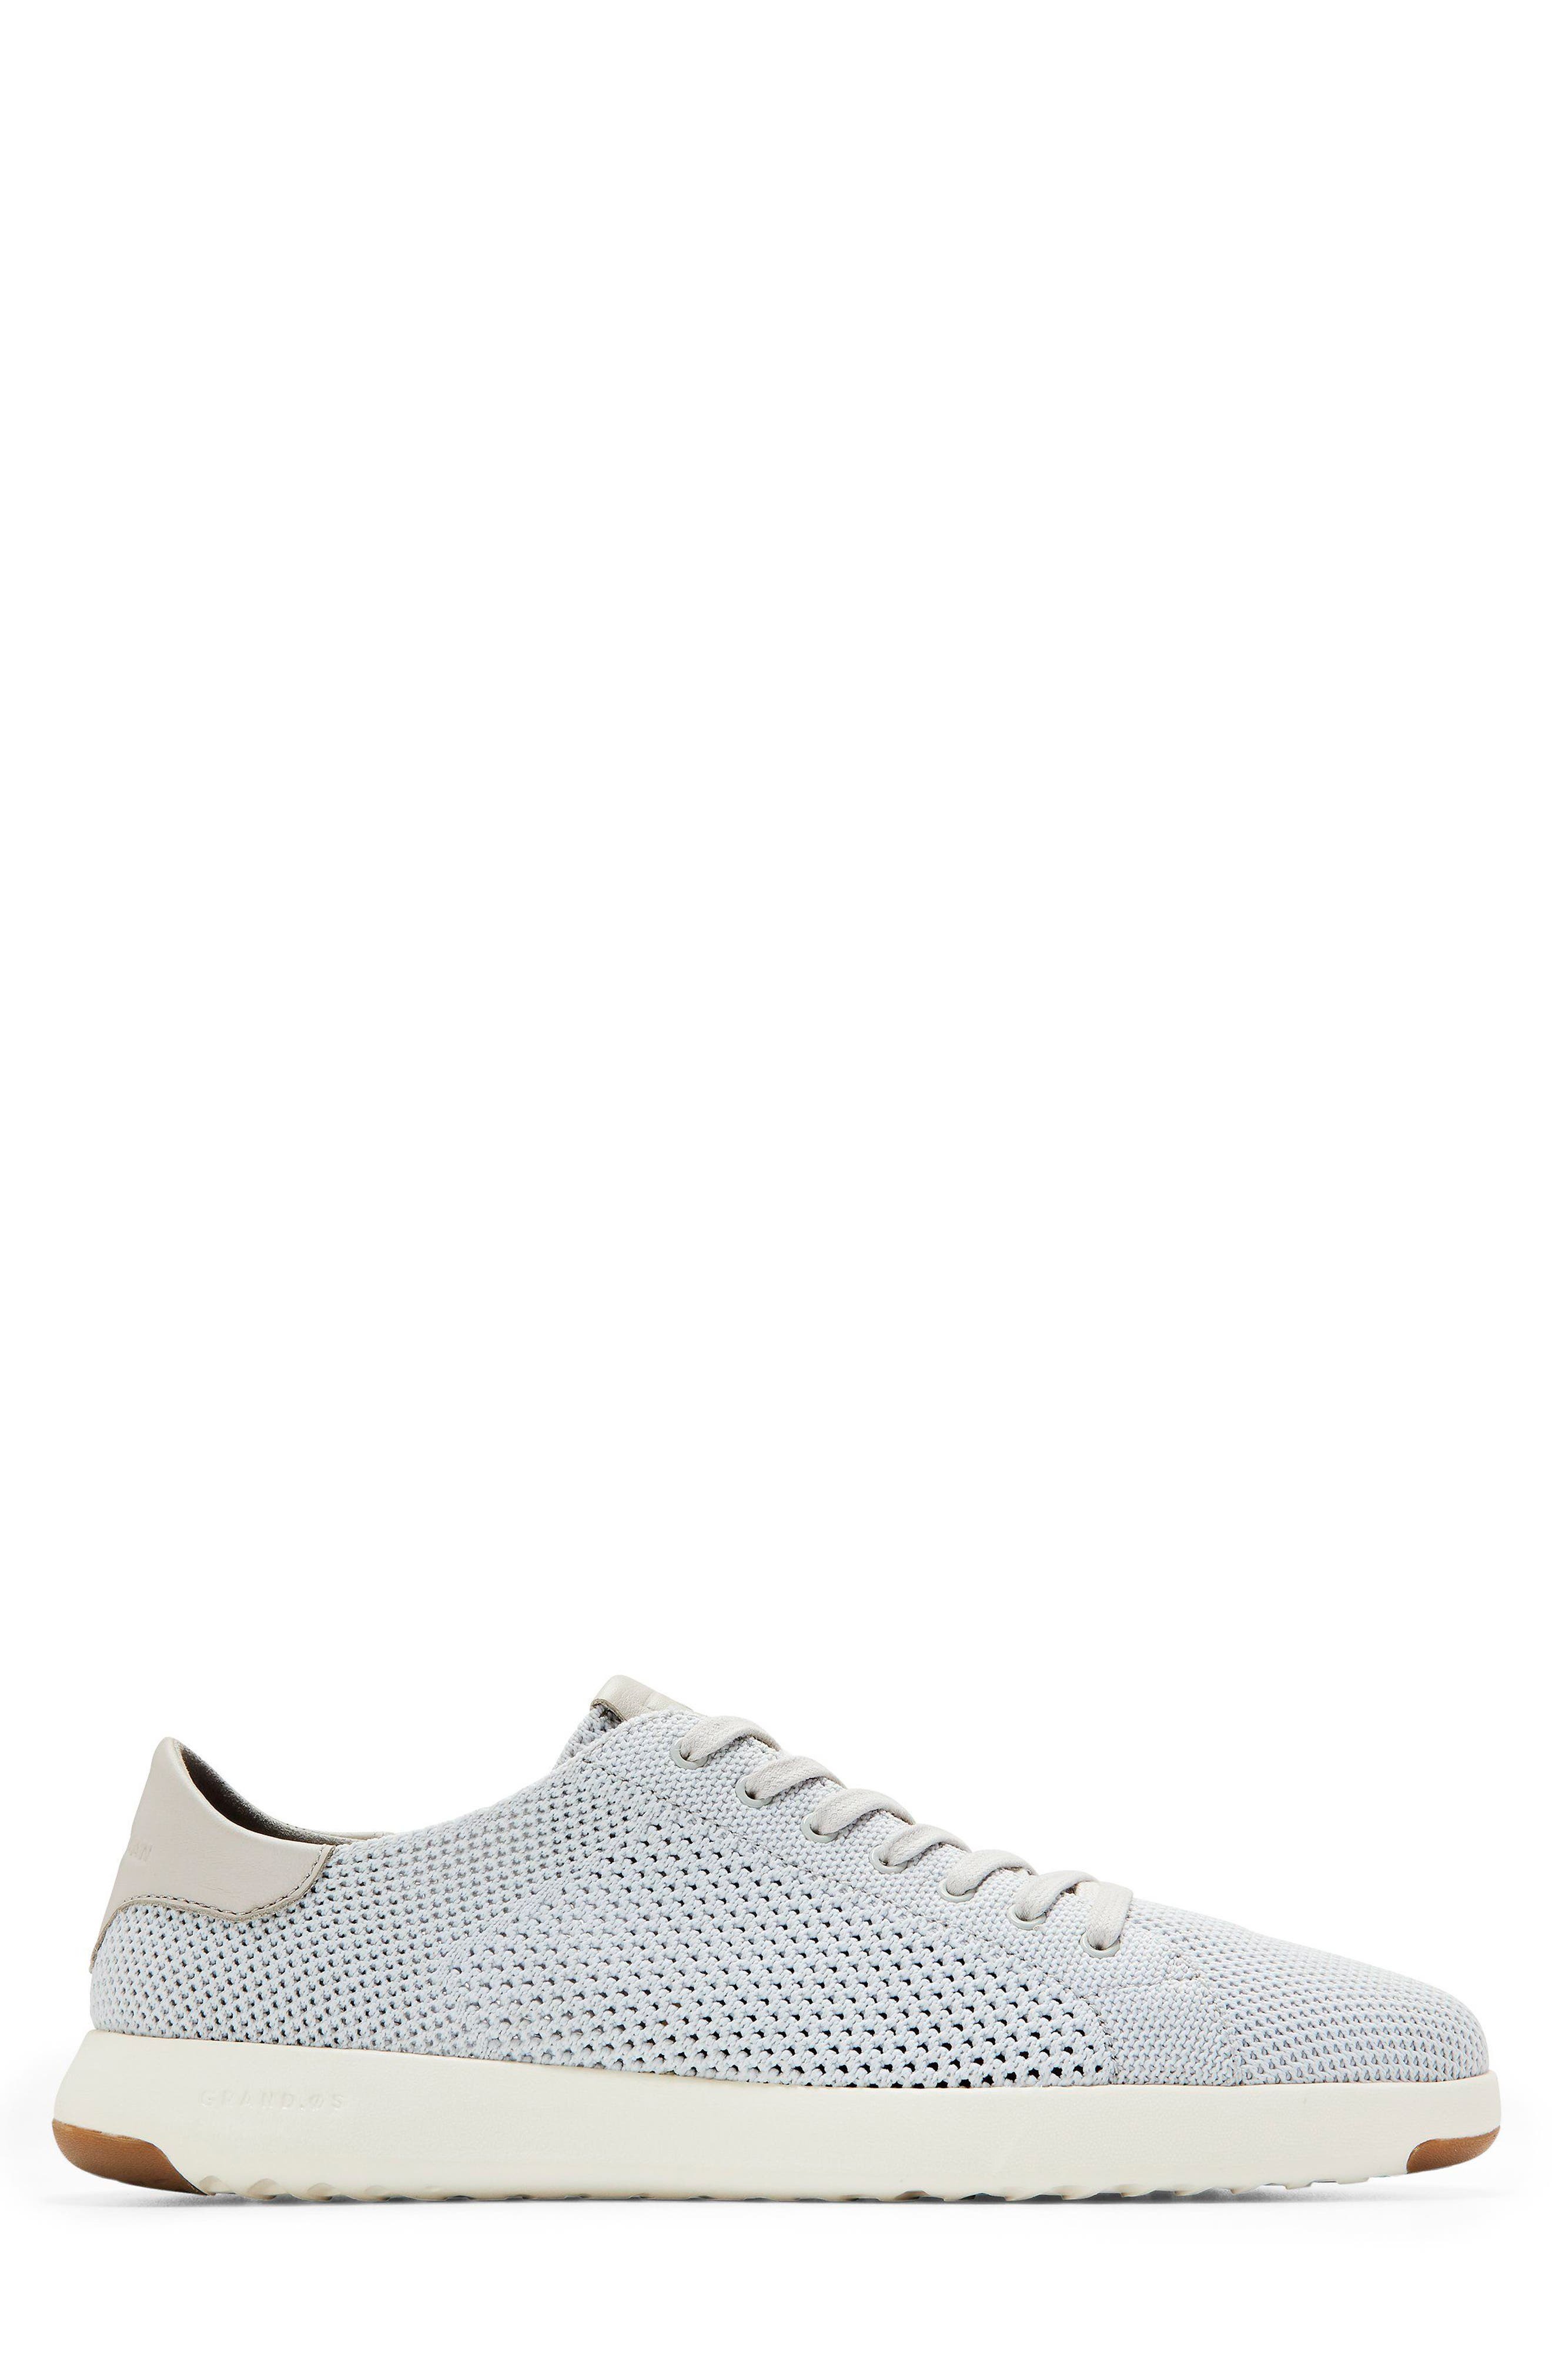 GrandPro Tennis Stitchlite Sneaker,                             Alternate thumbnail 3, color,                             Vapor Gray/ Optic White